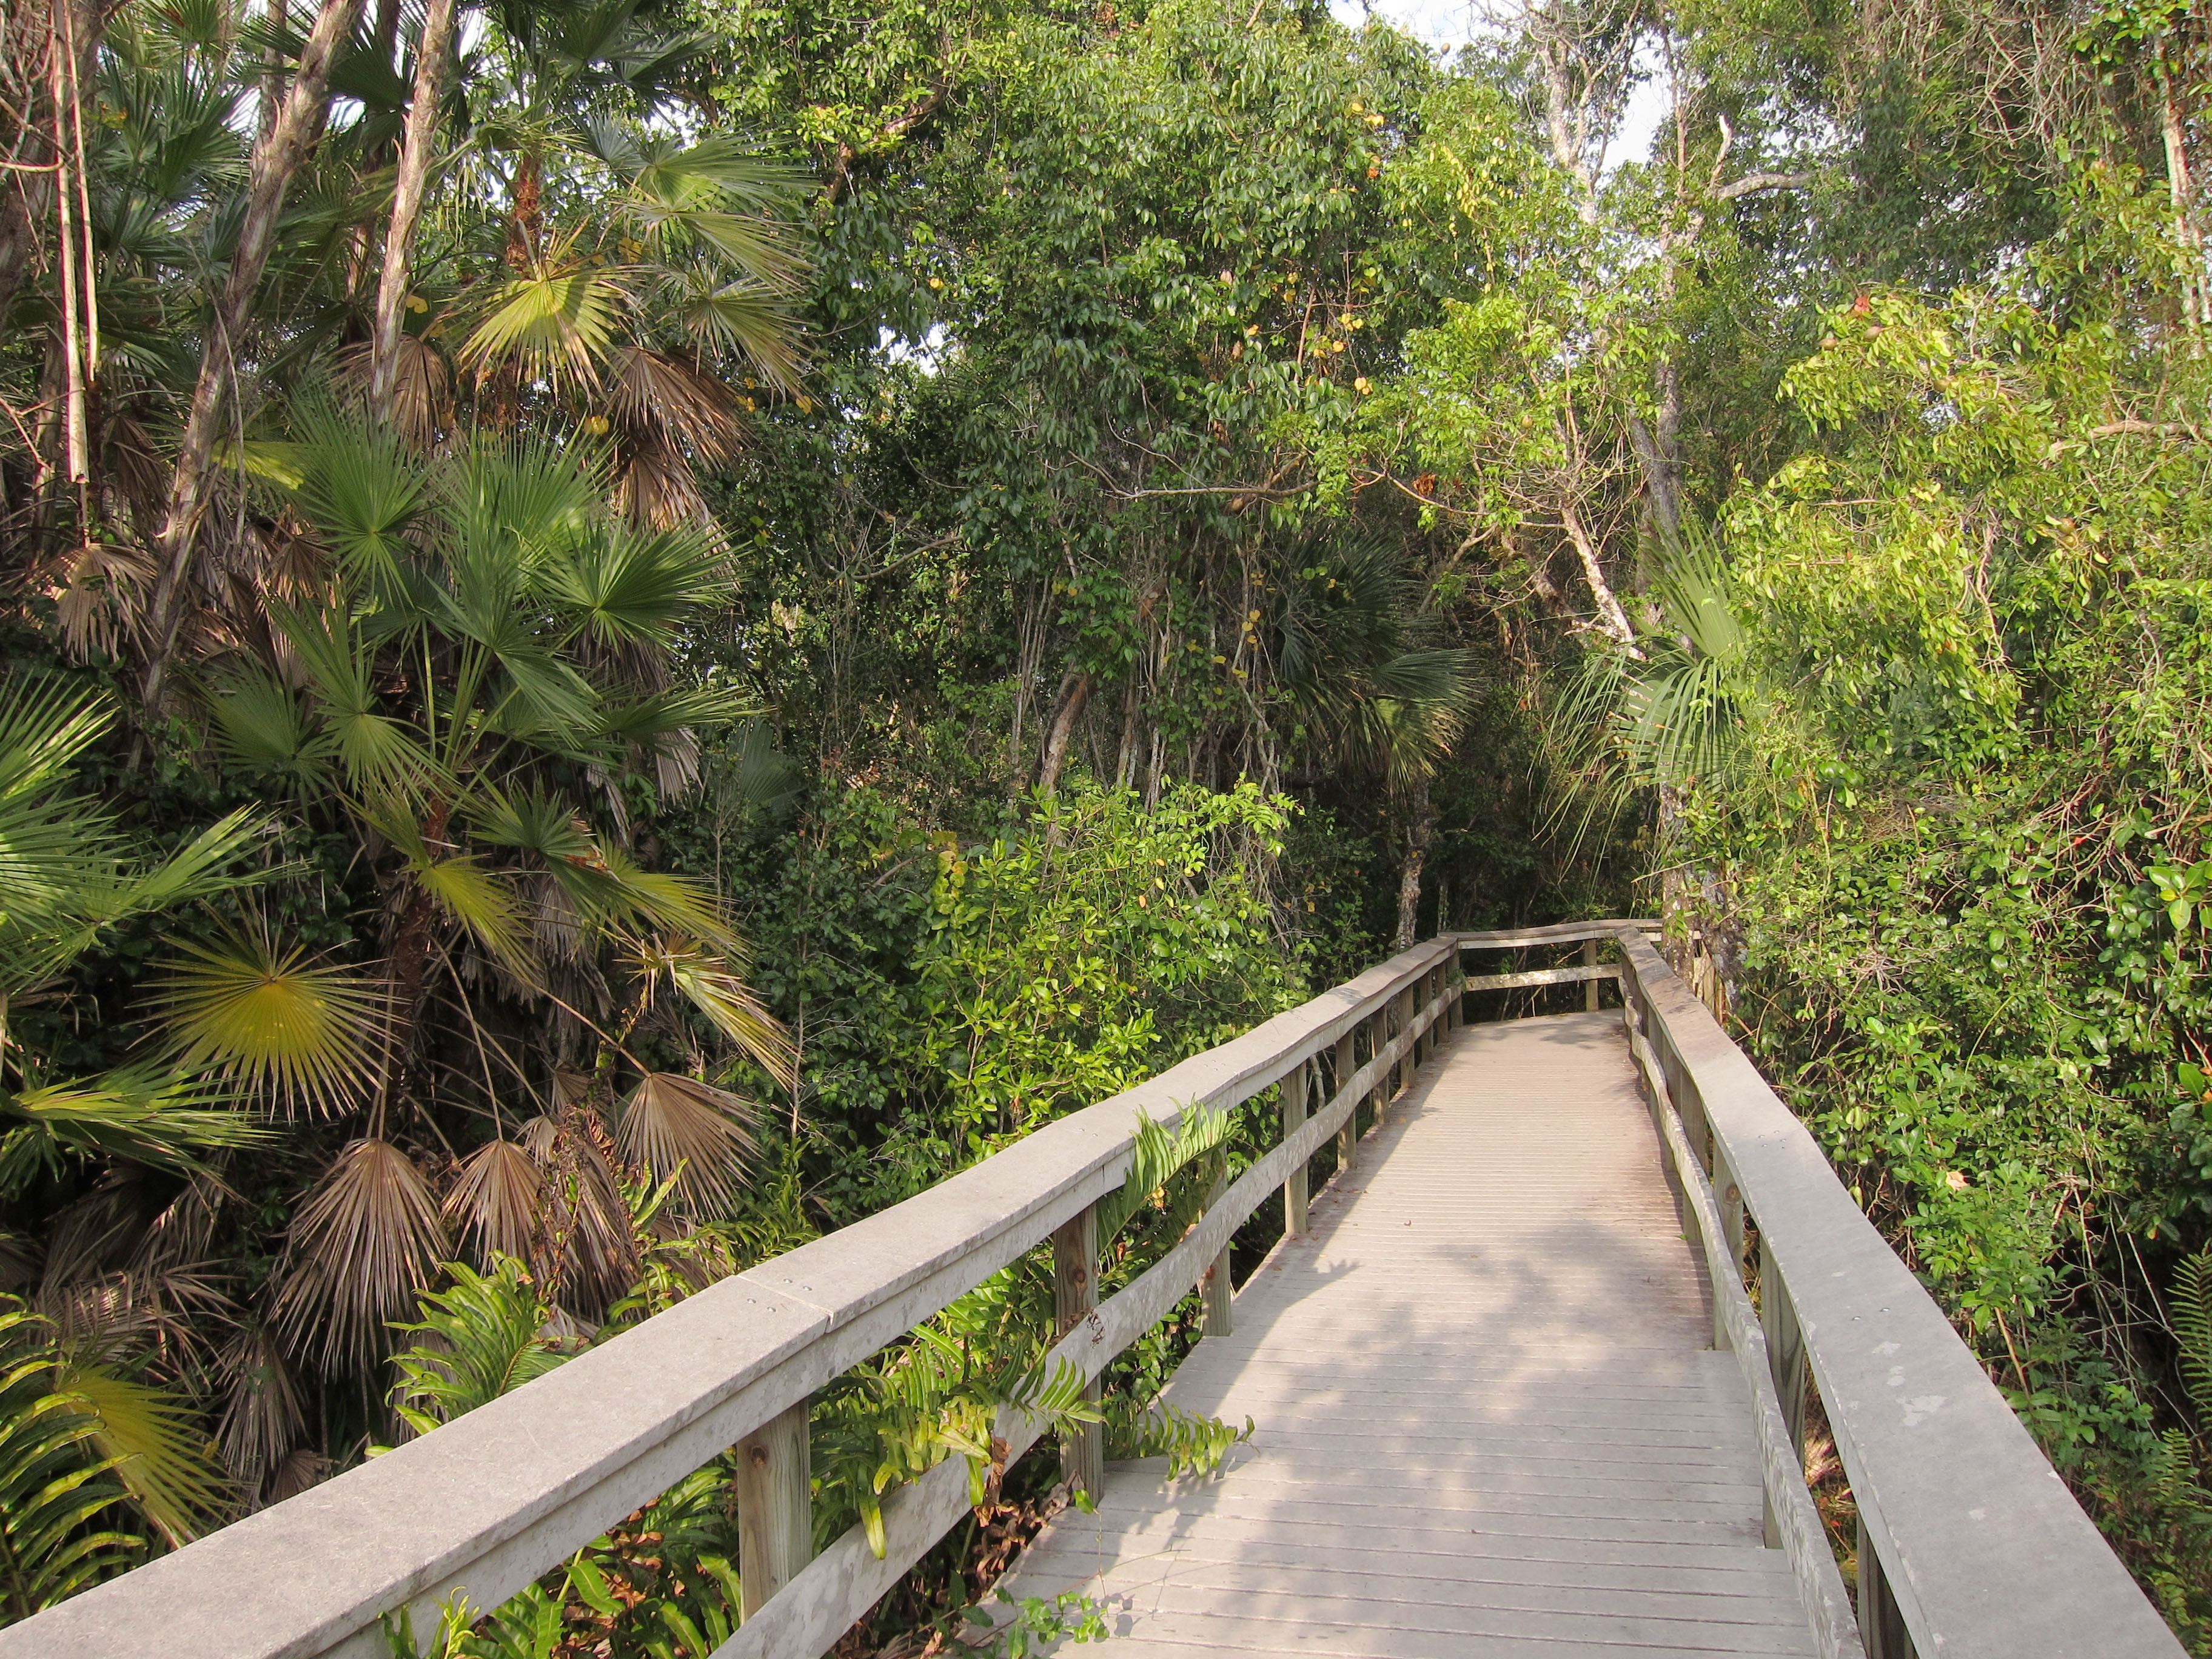 Tropical hardwood hammock - Wikipedia